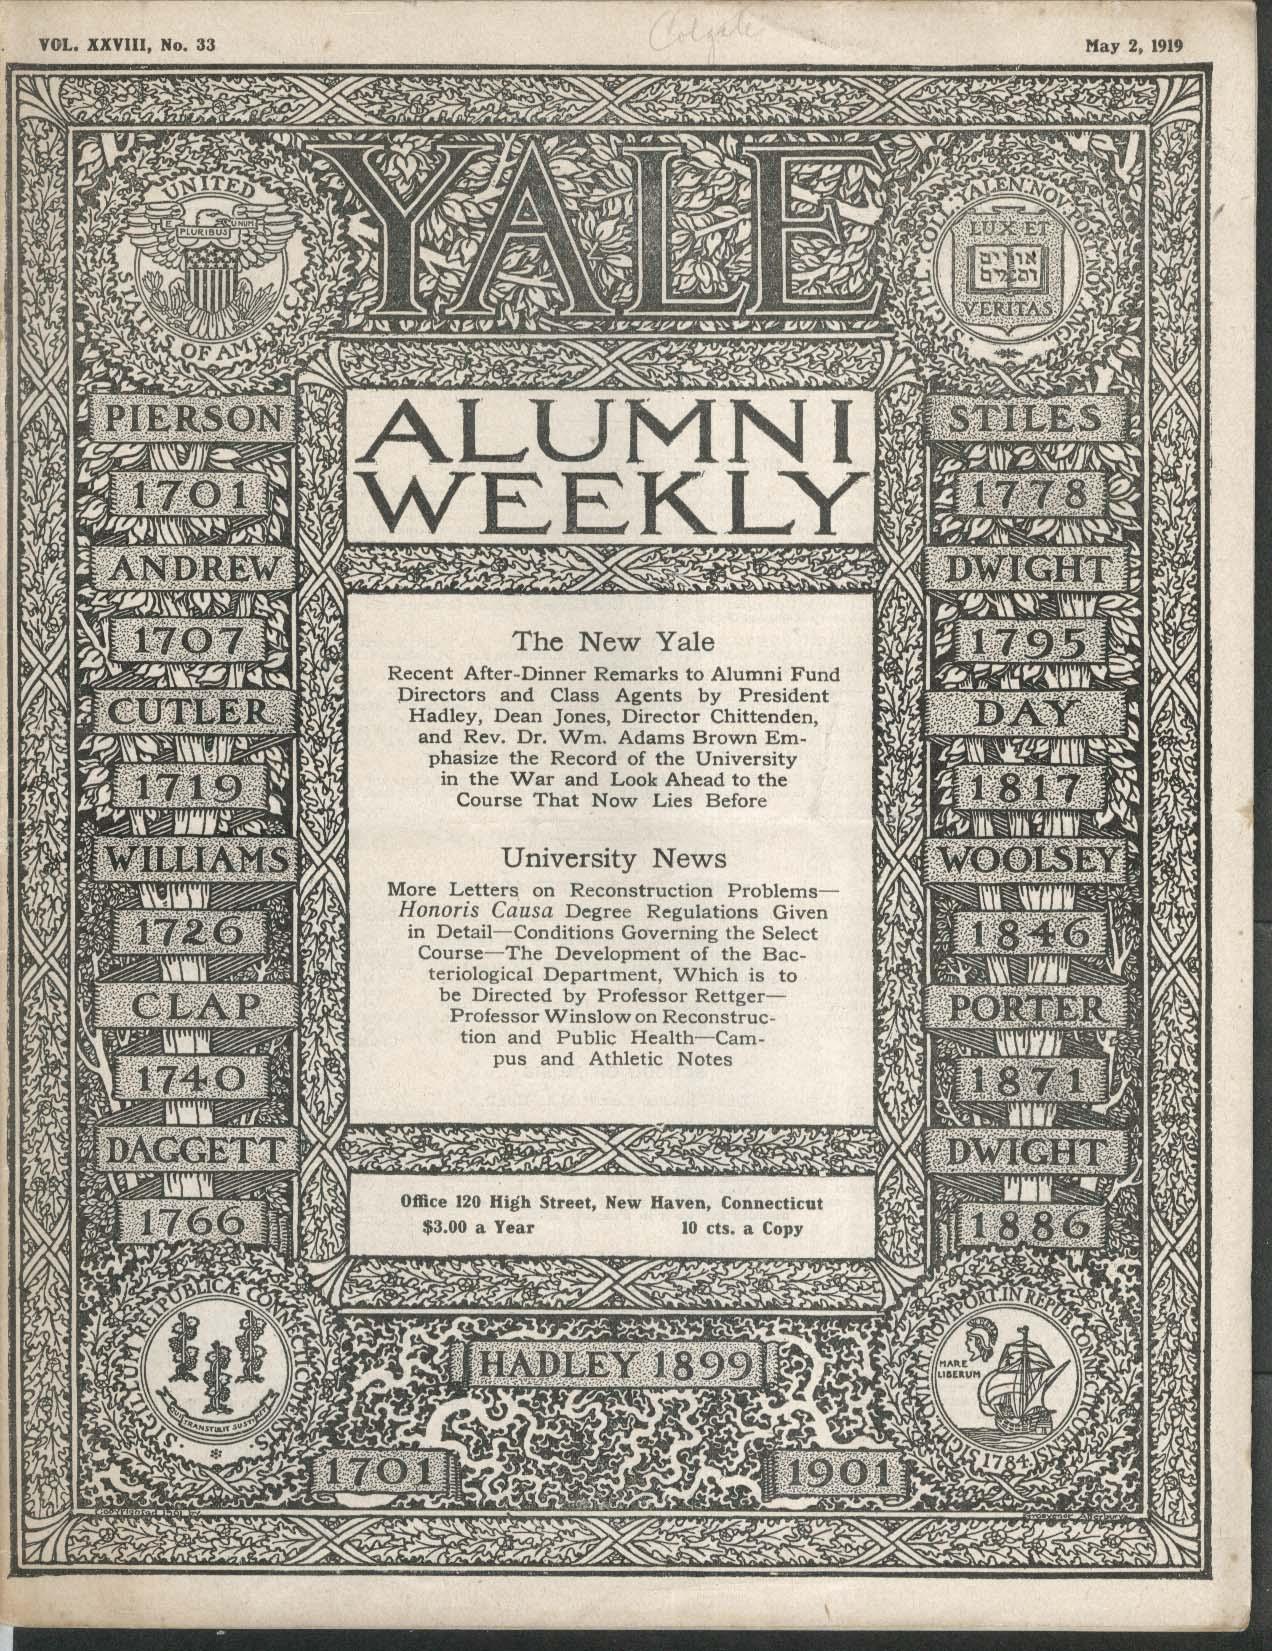 YALE ALUMNI WEEKLY War Record Thomas Miller Alumni Fund Dinner 5/2 1919